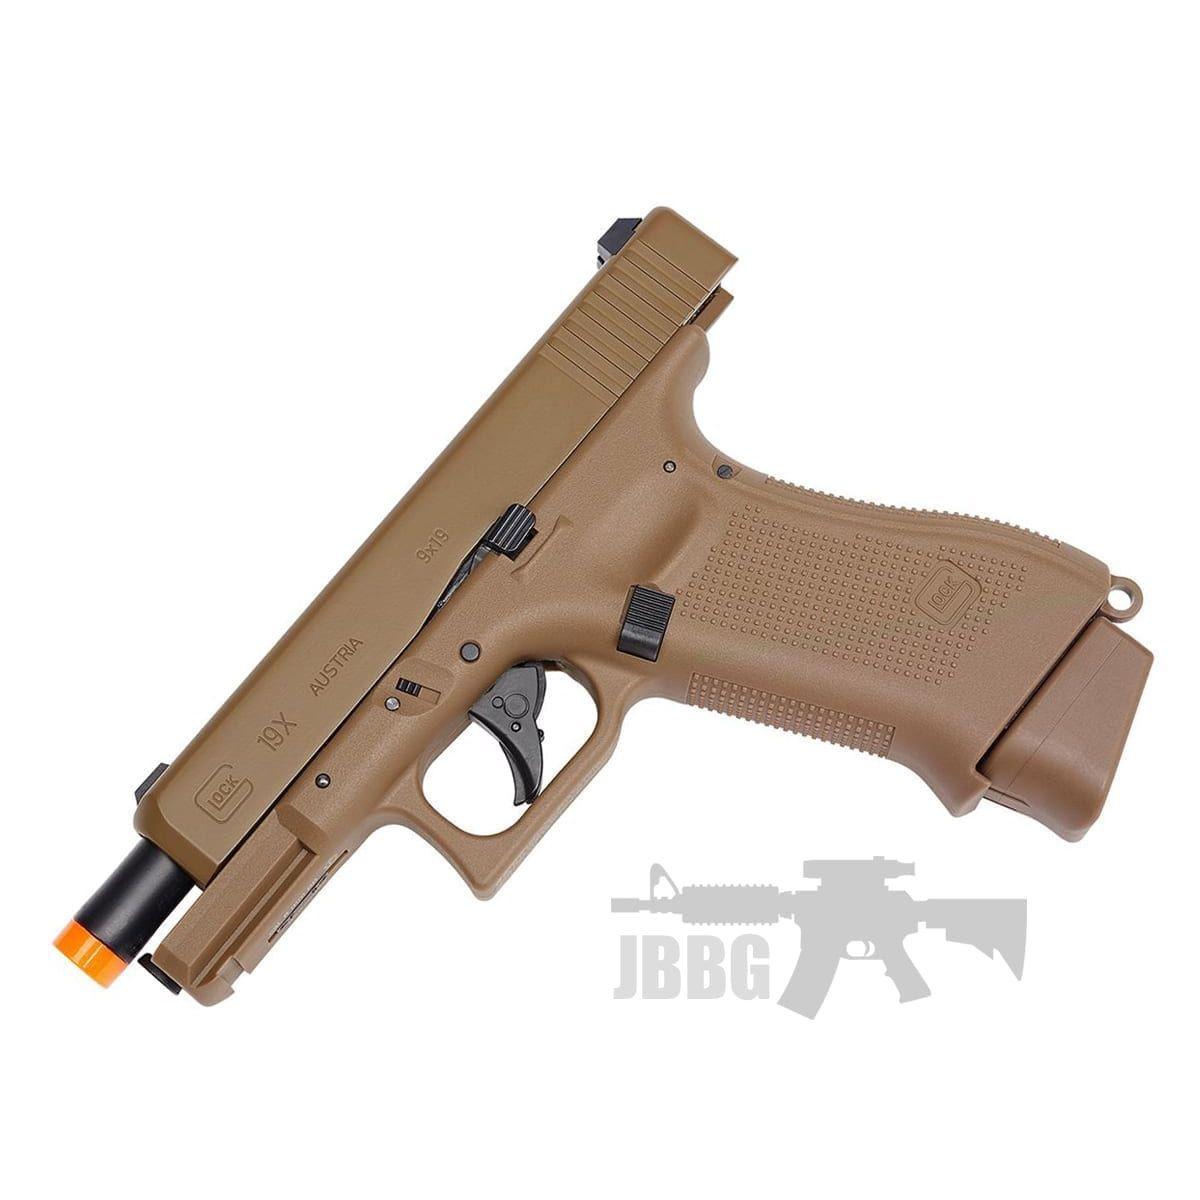 ef airsoft pistol